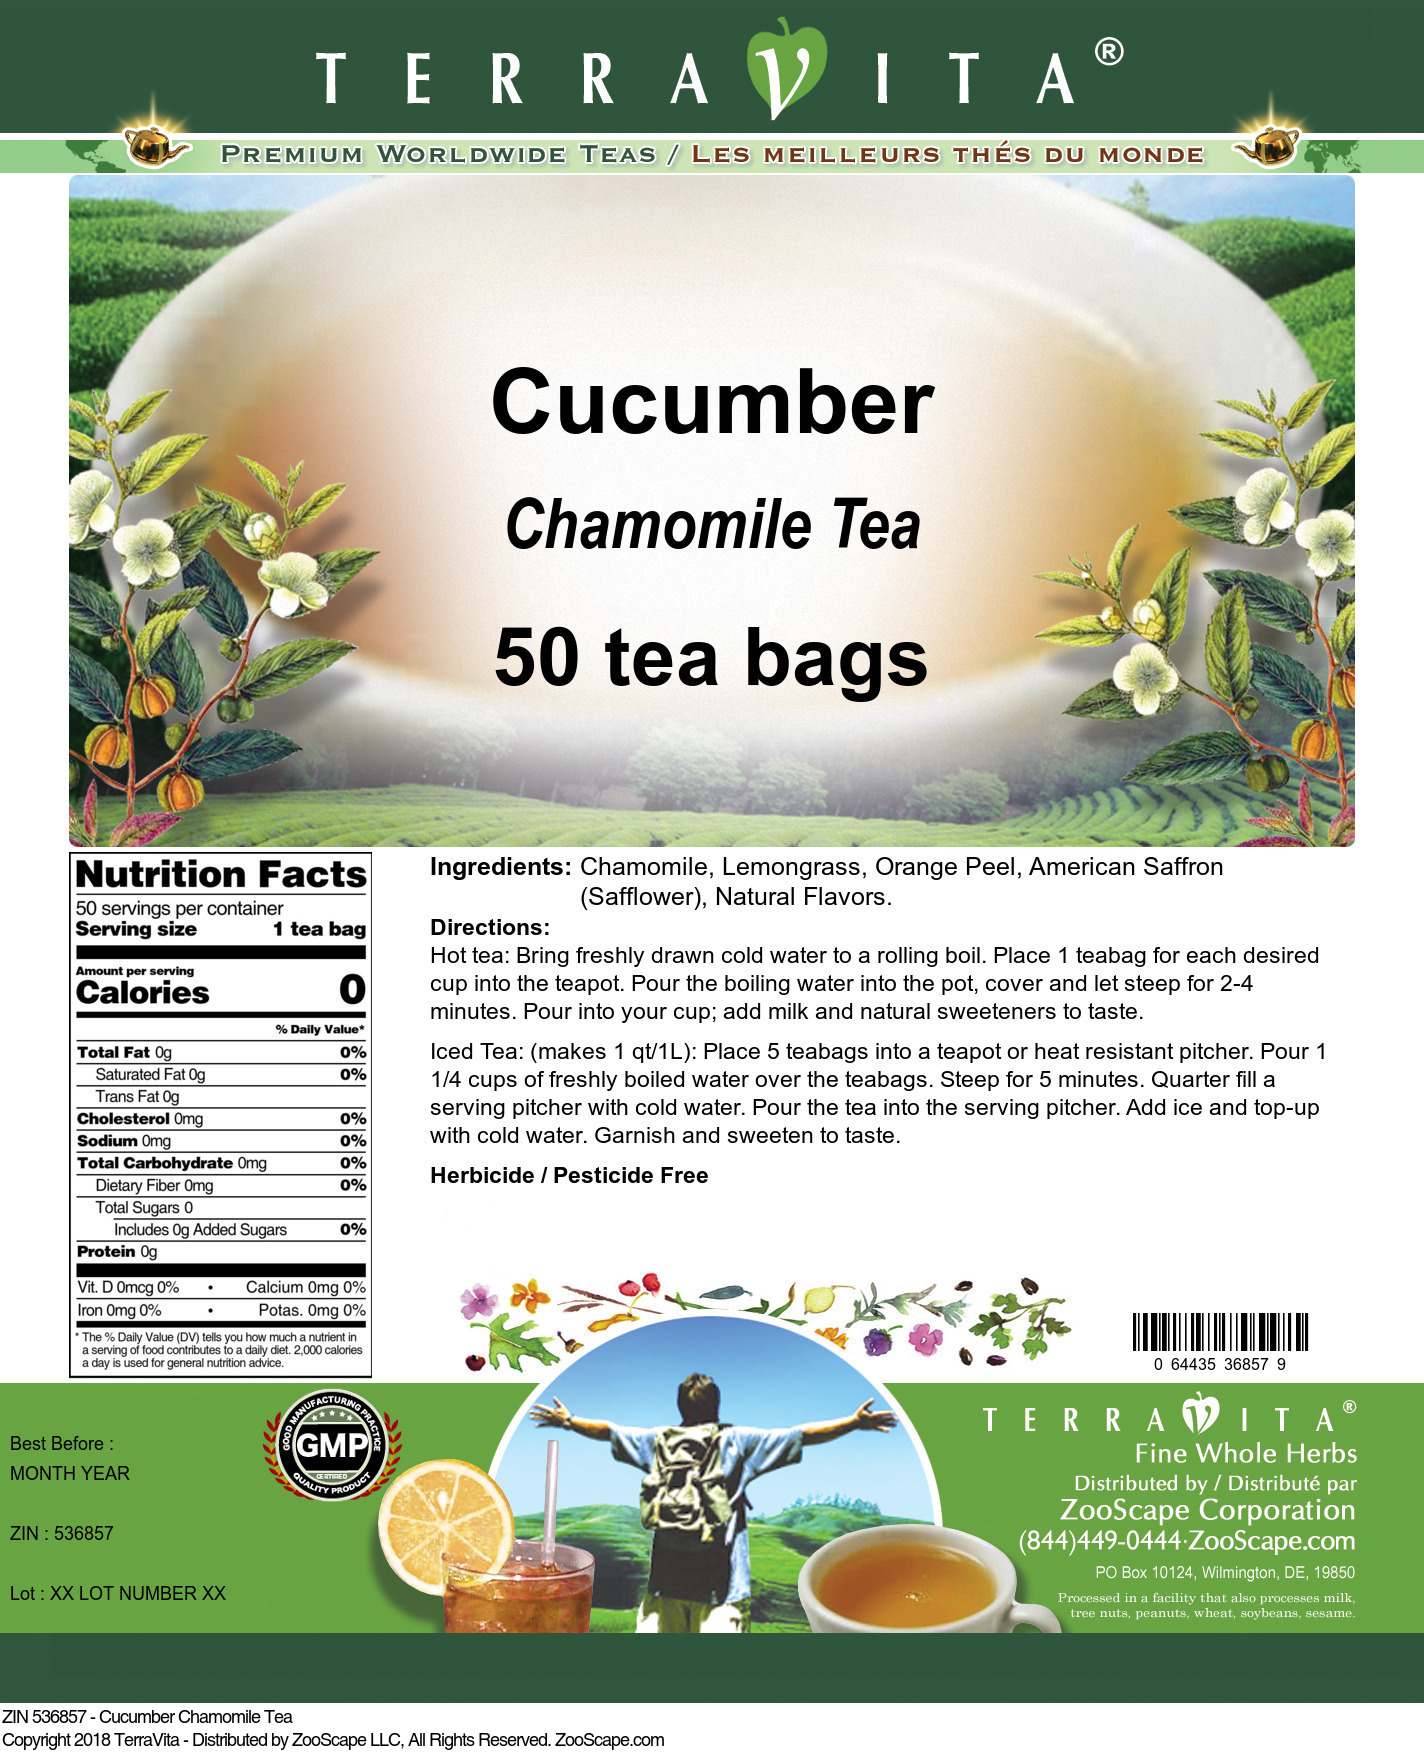 Cucumber Chamomile Tea